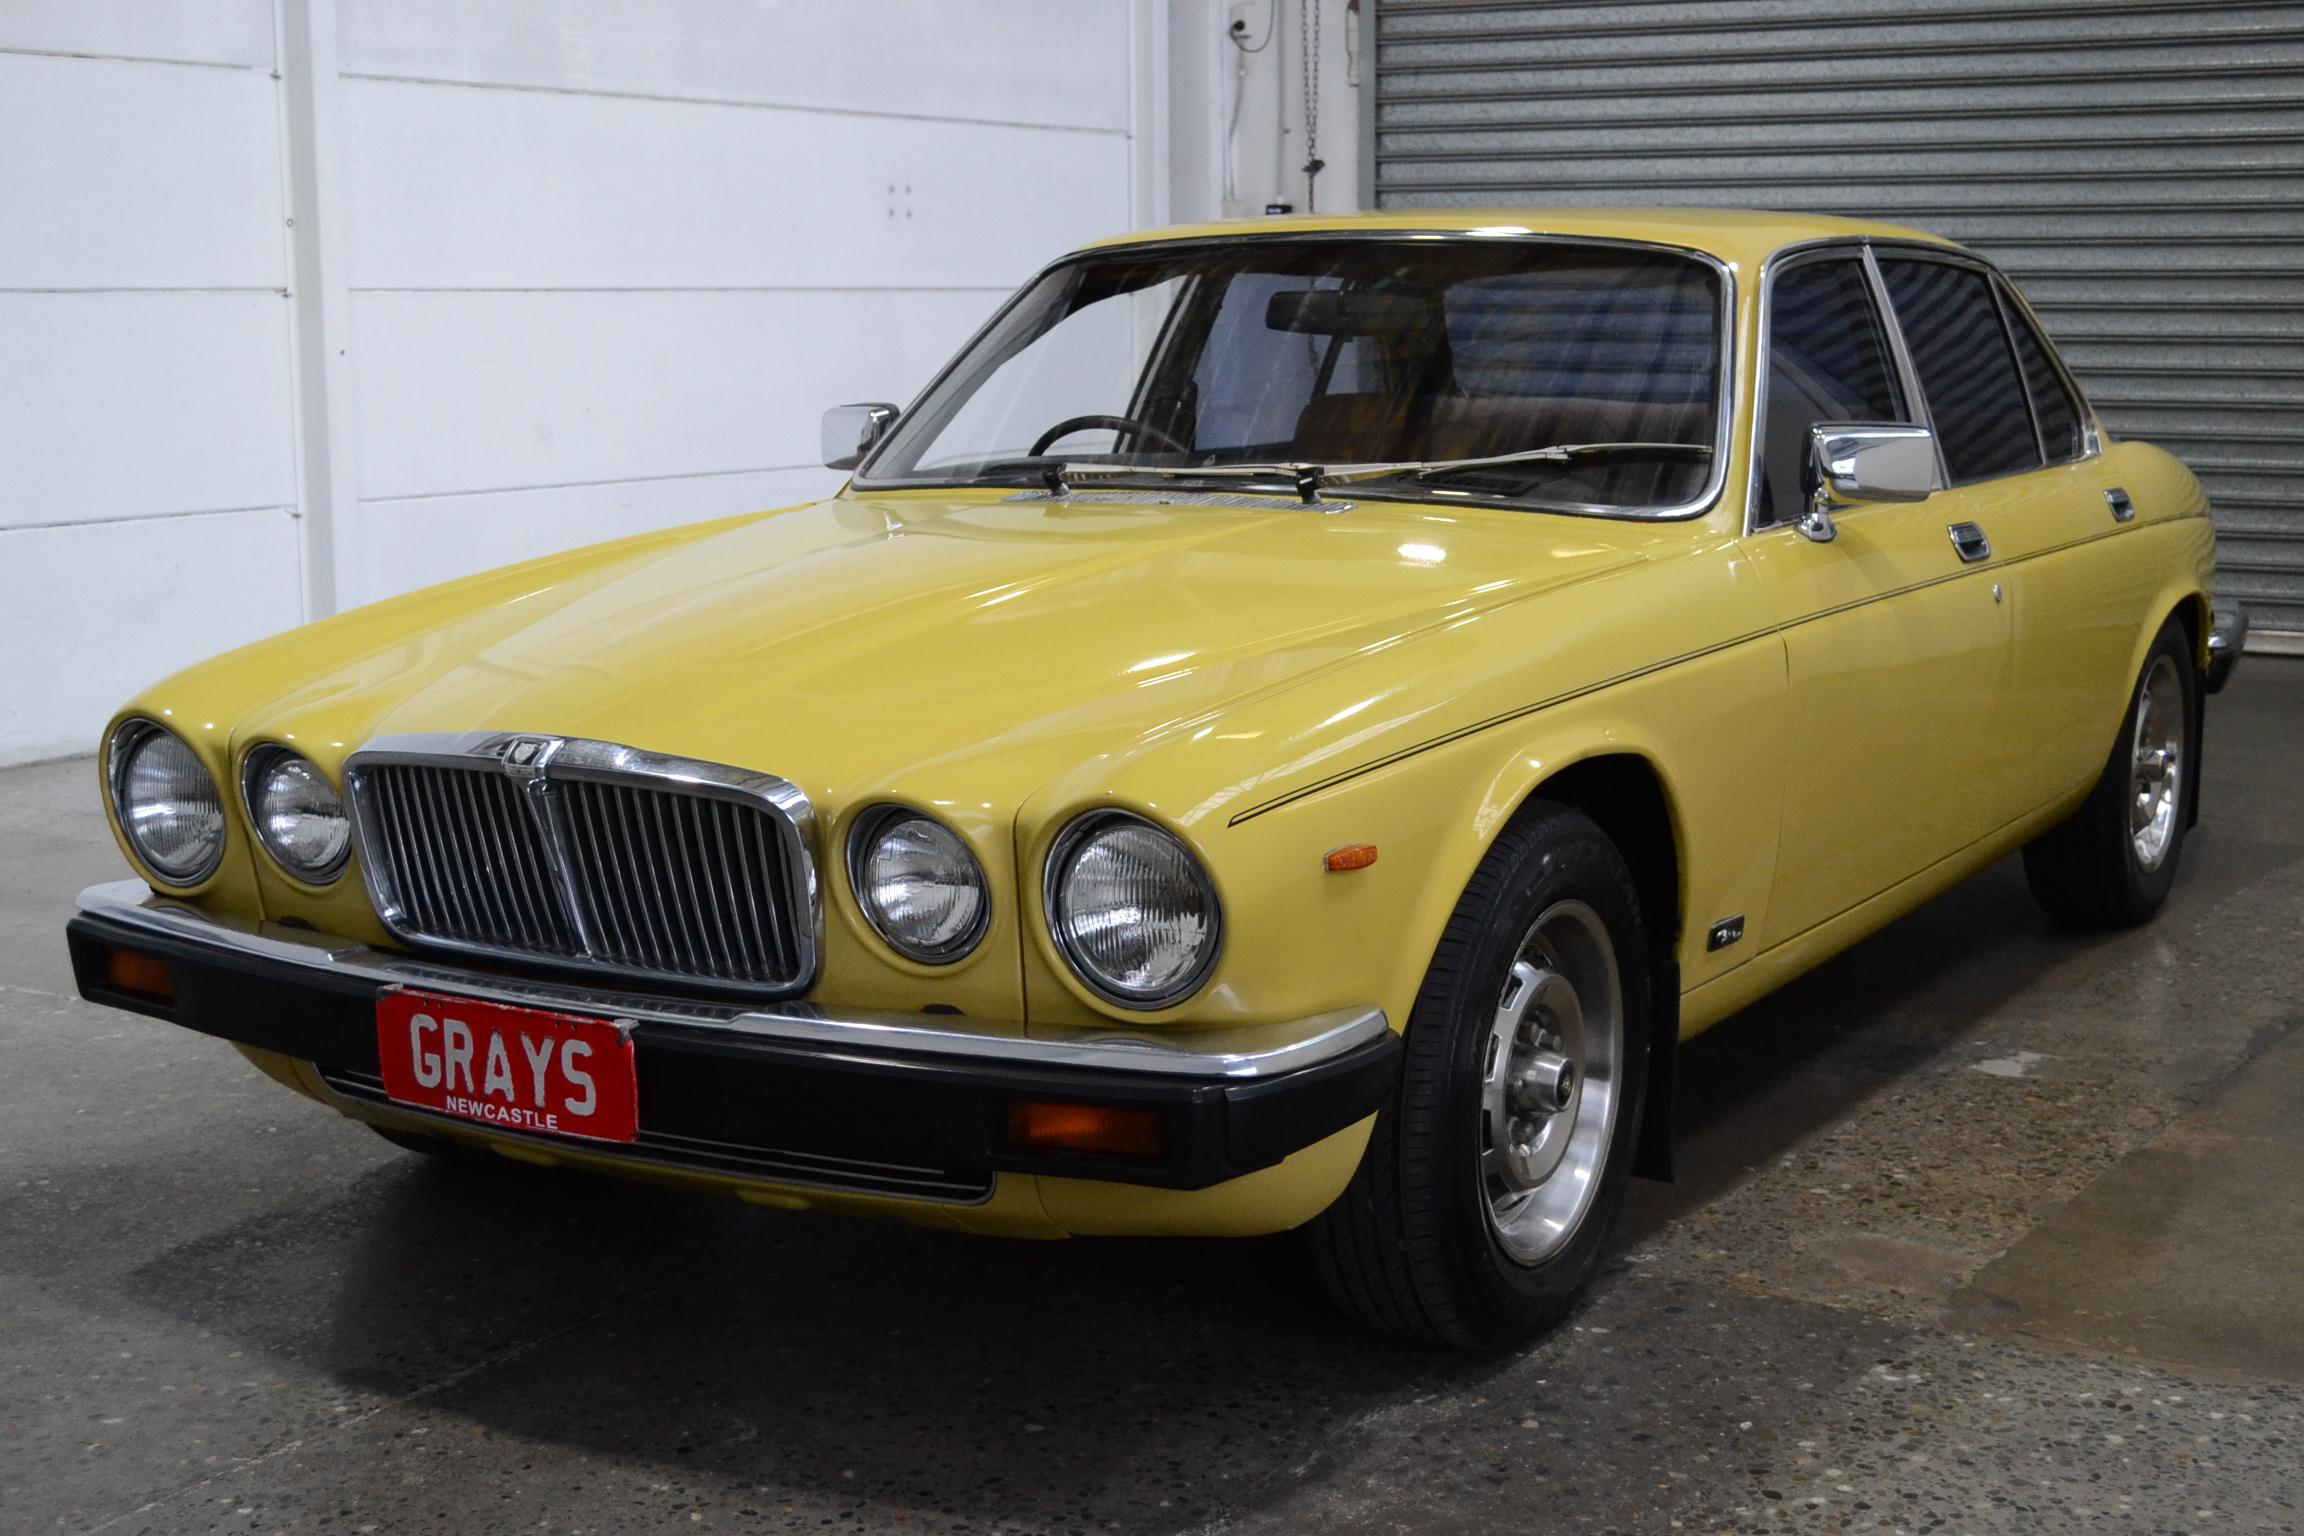 1980 Jaguar XJ6 Series 3 Auto Sedan Cotswold Gold